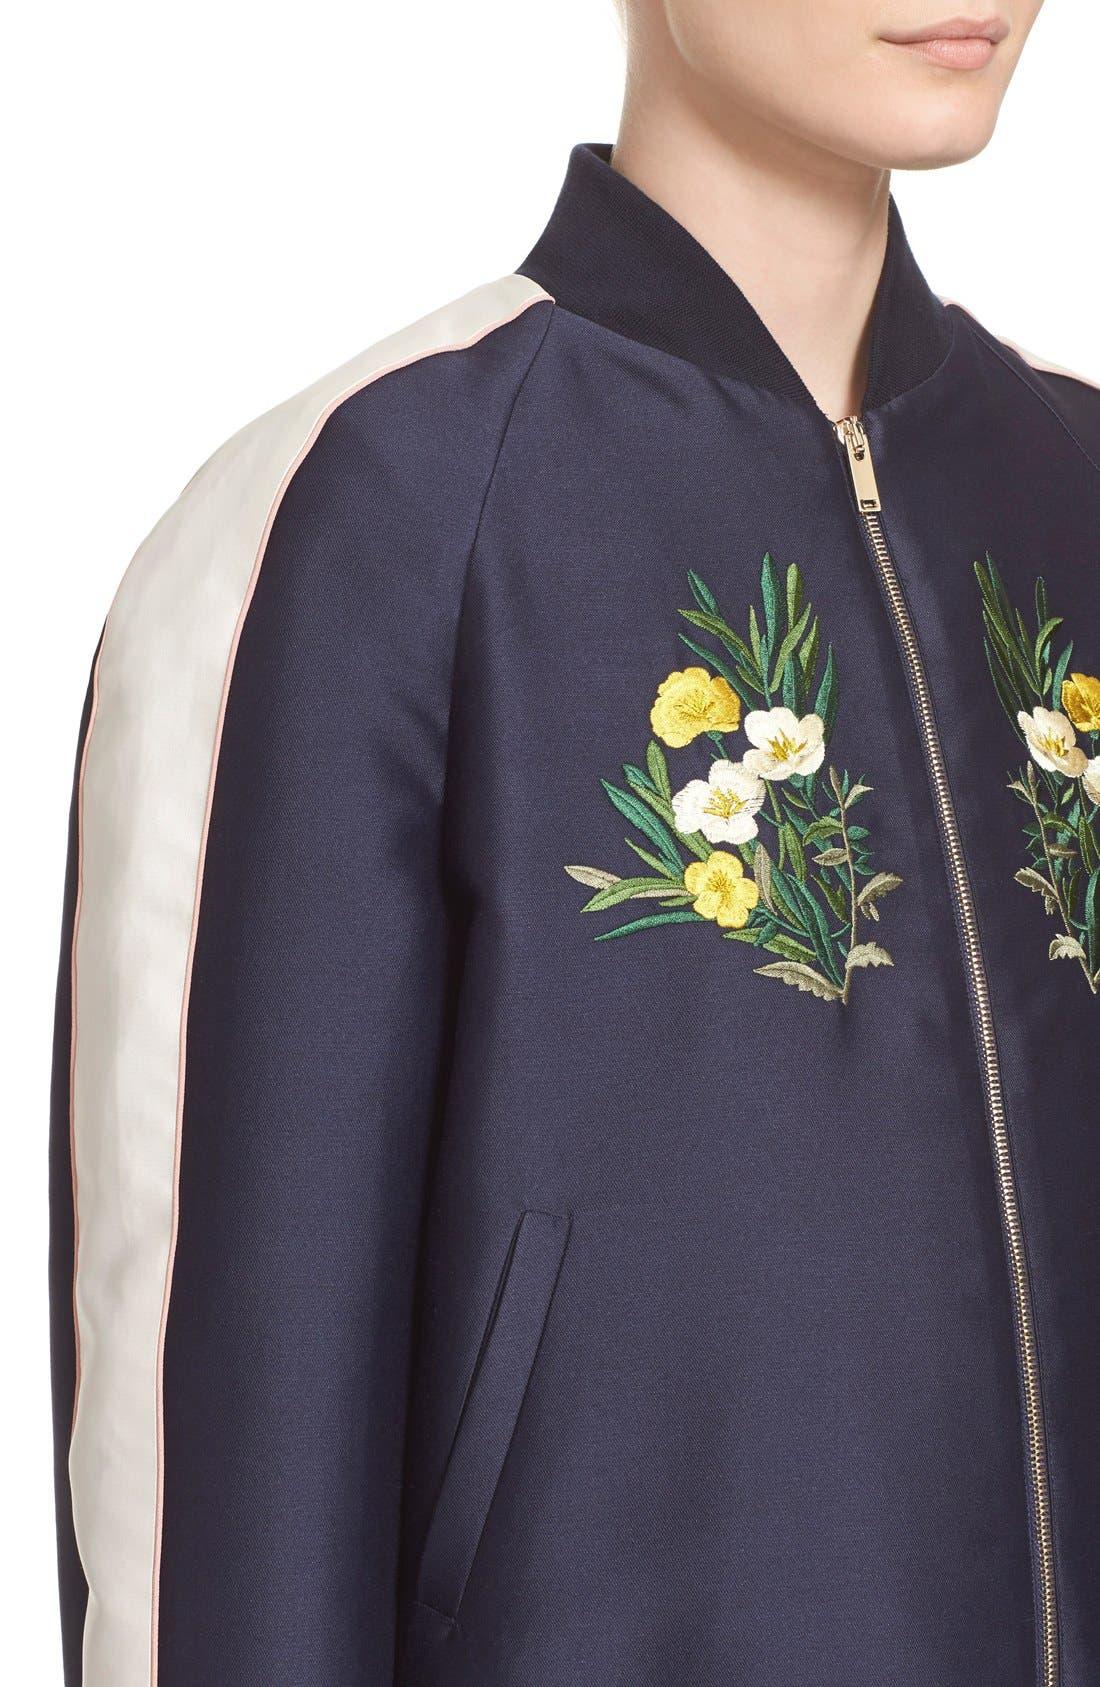 'Lorinda' Floral Embroidered Bomber Jacket,                             Alternate thumbnail 2, color,                             009